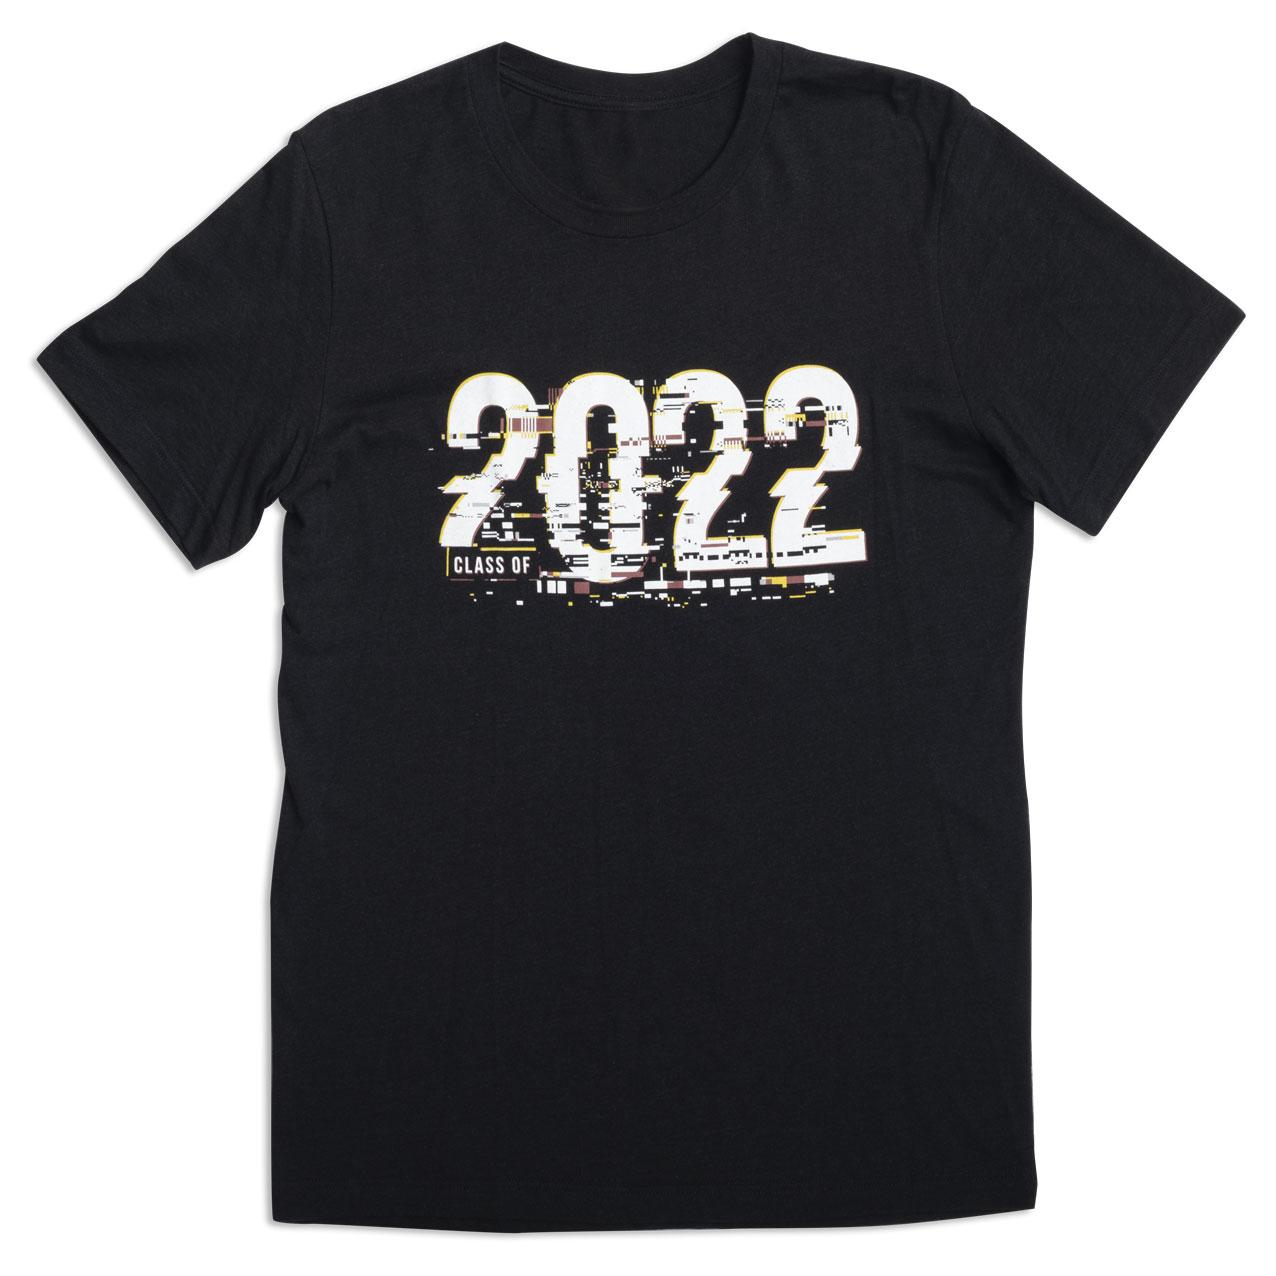 2022 Glitch T-Shirt, Heather Black